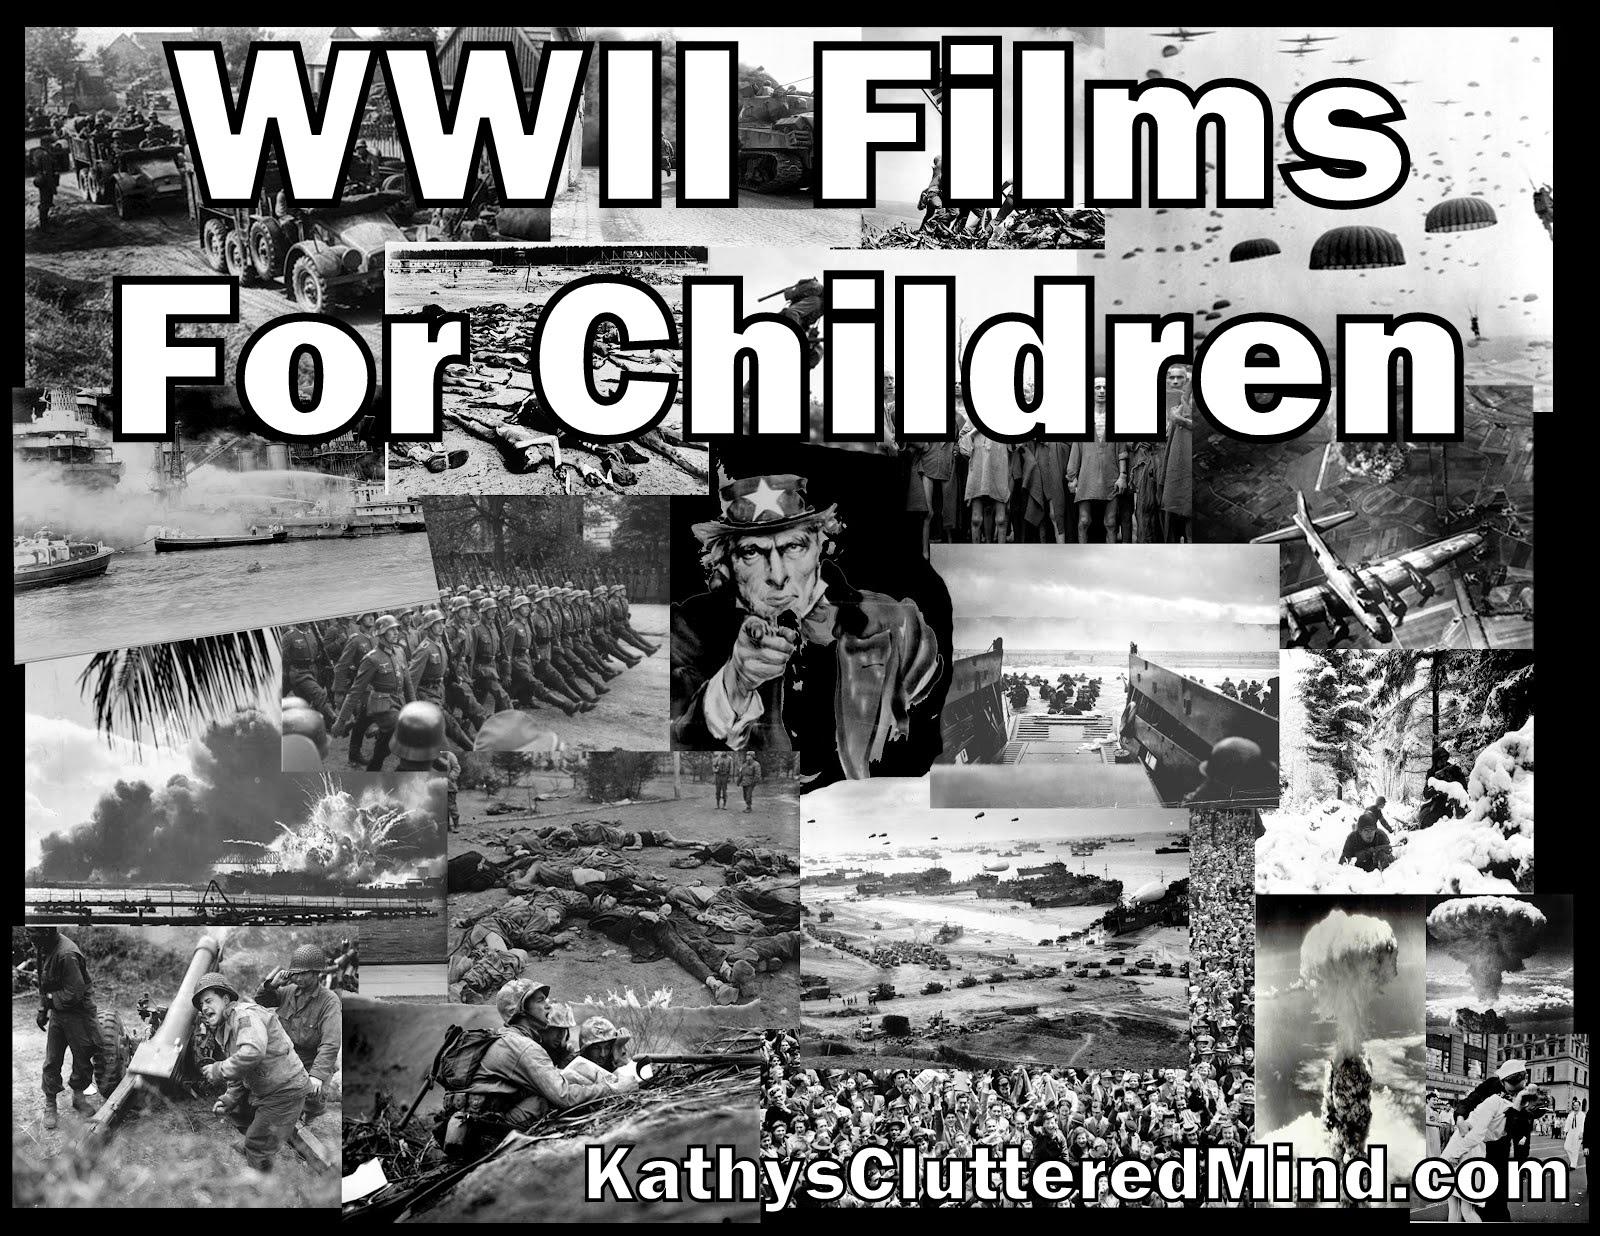 Kathys Cluttered Mind: World War II Films For Children